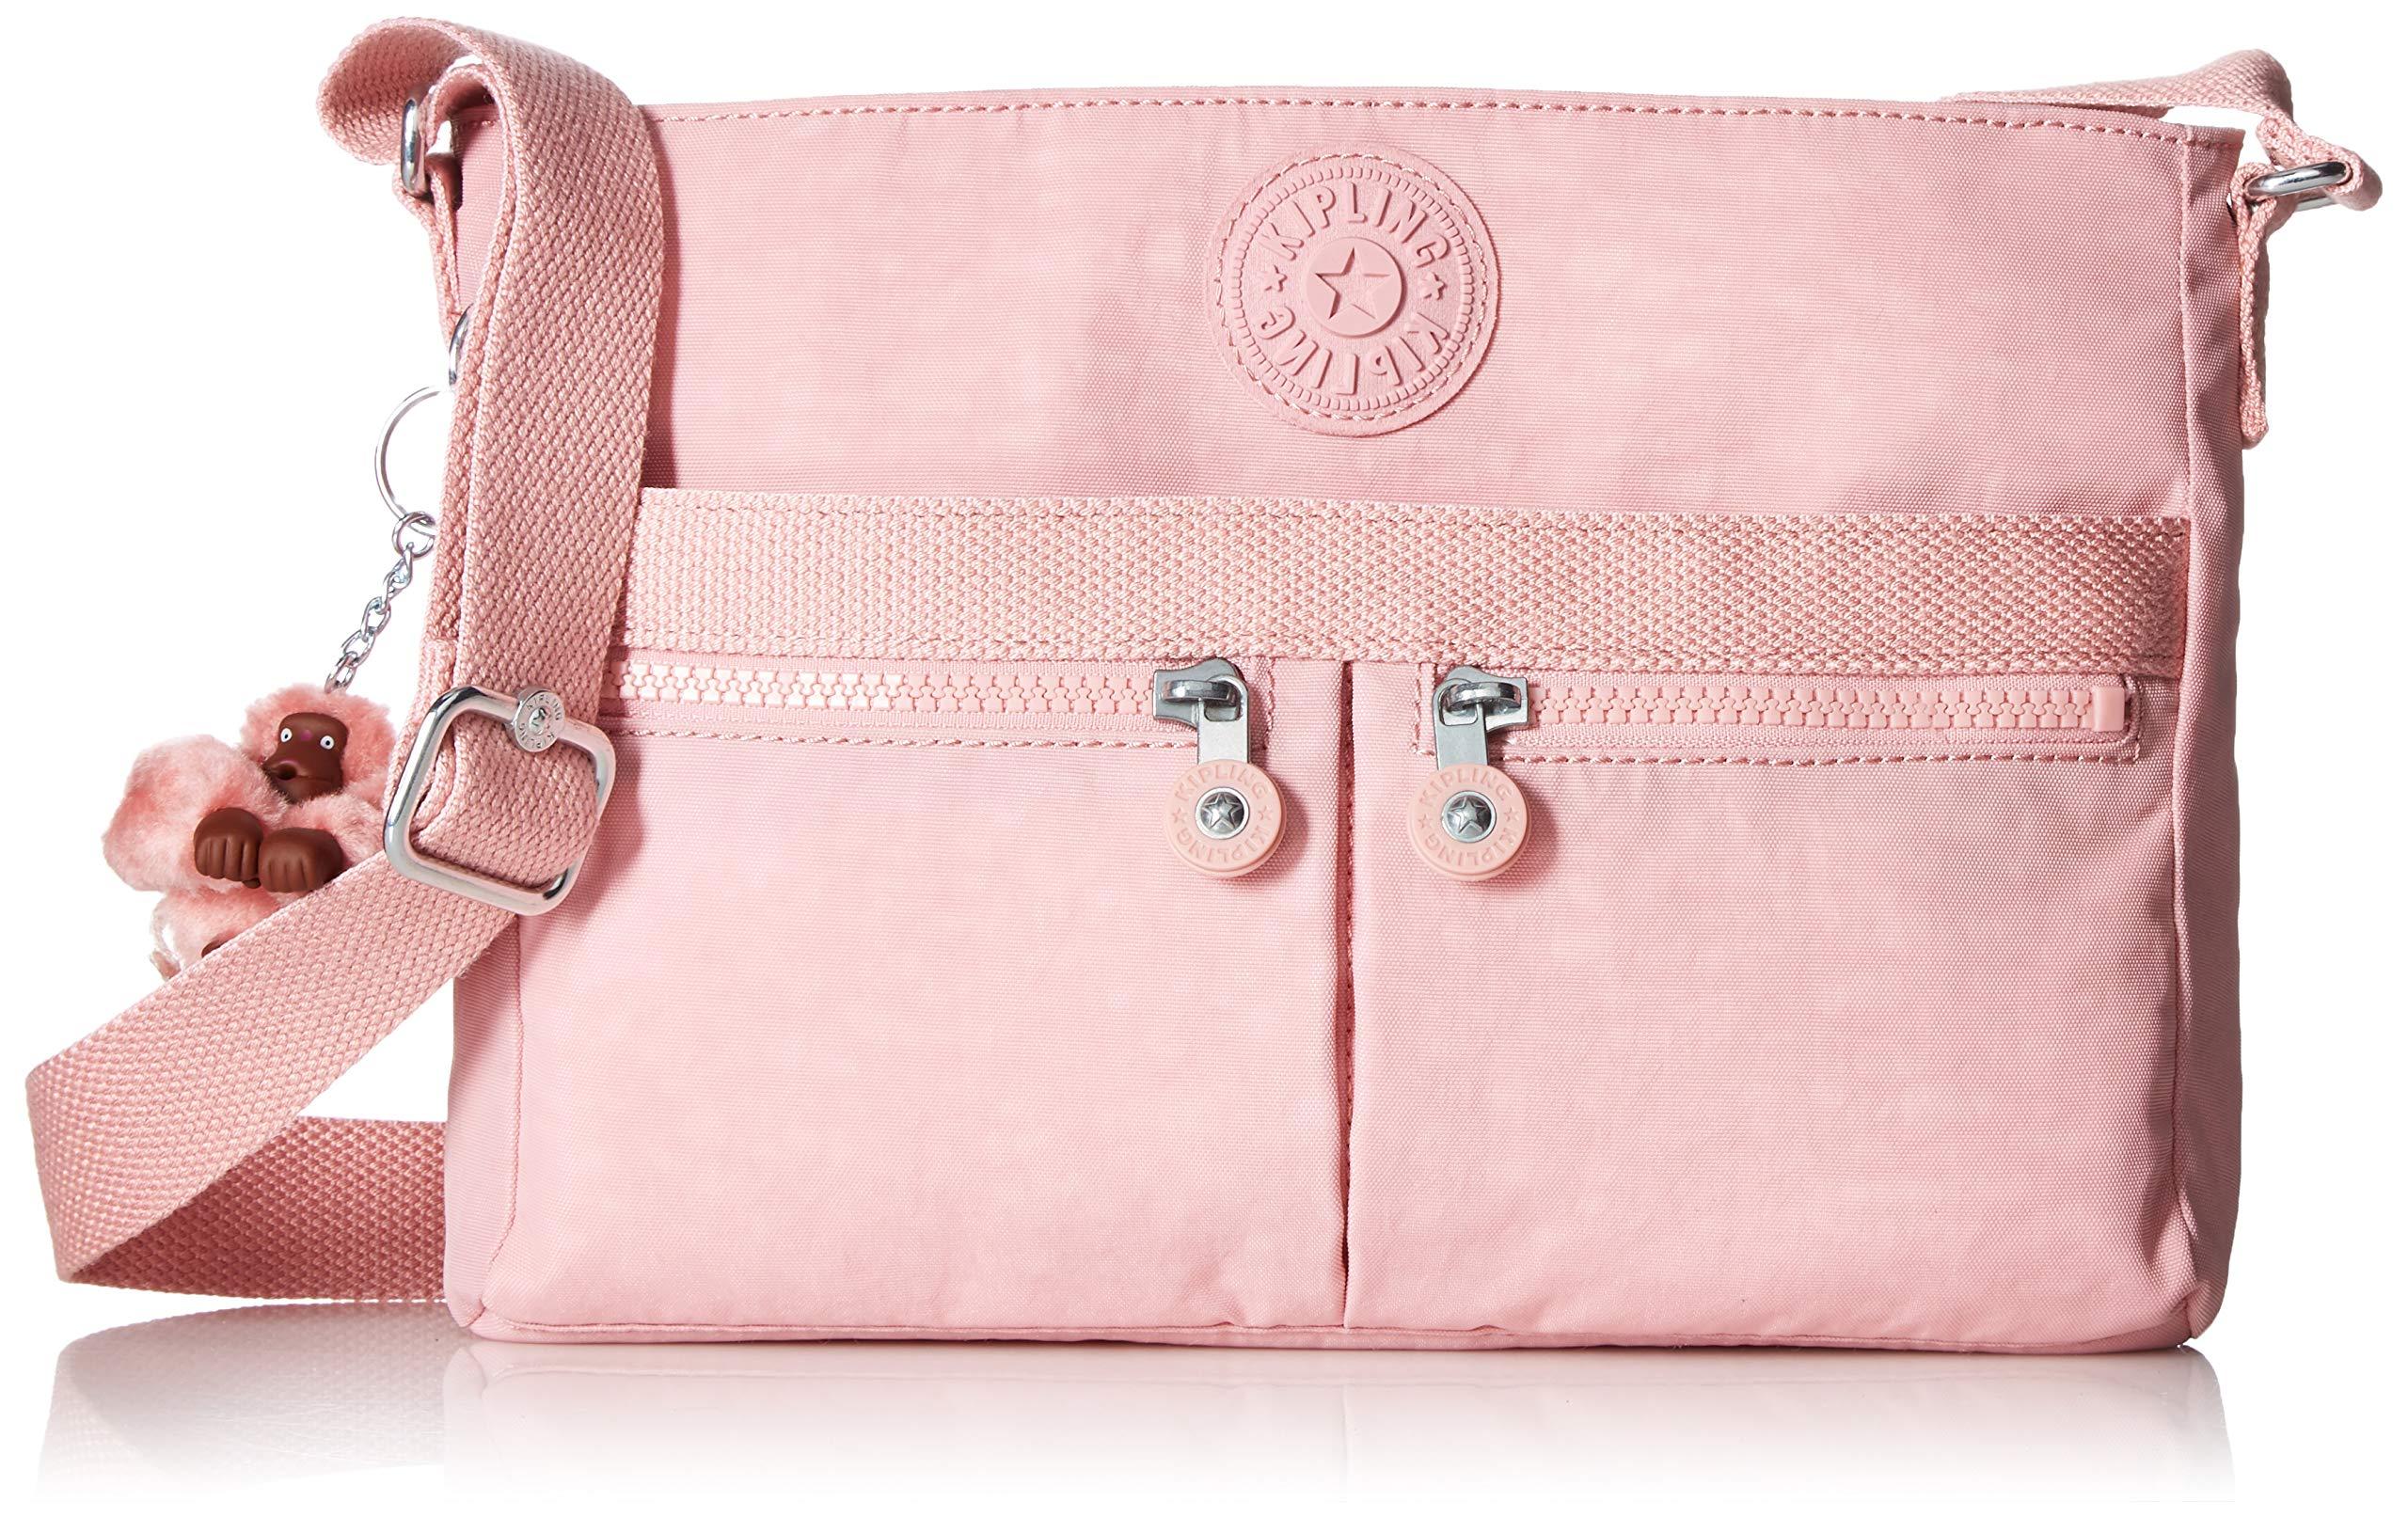 Kipling Women's Angie Crossbody Bag, Adjustable Shoulder Strap, Zip Closure, strawberry pink tonal